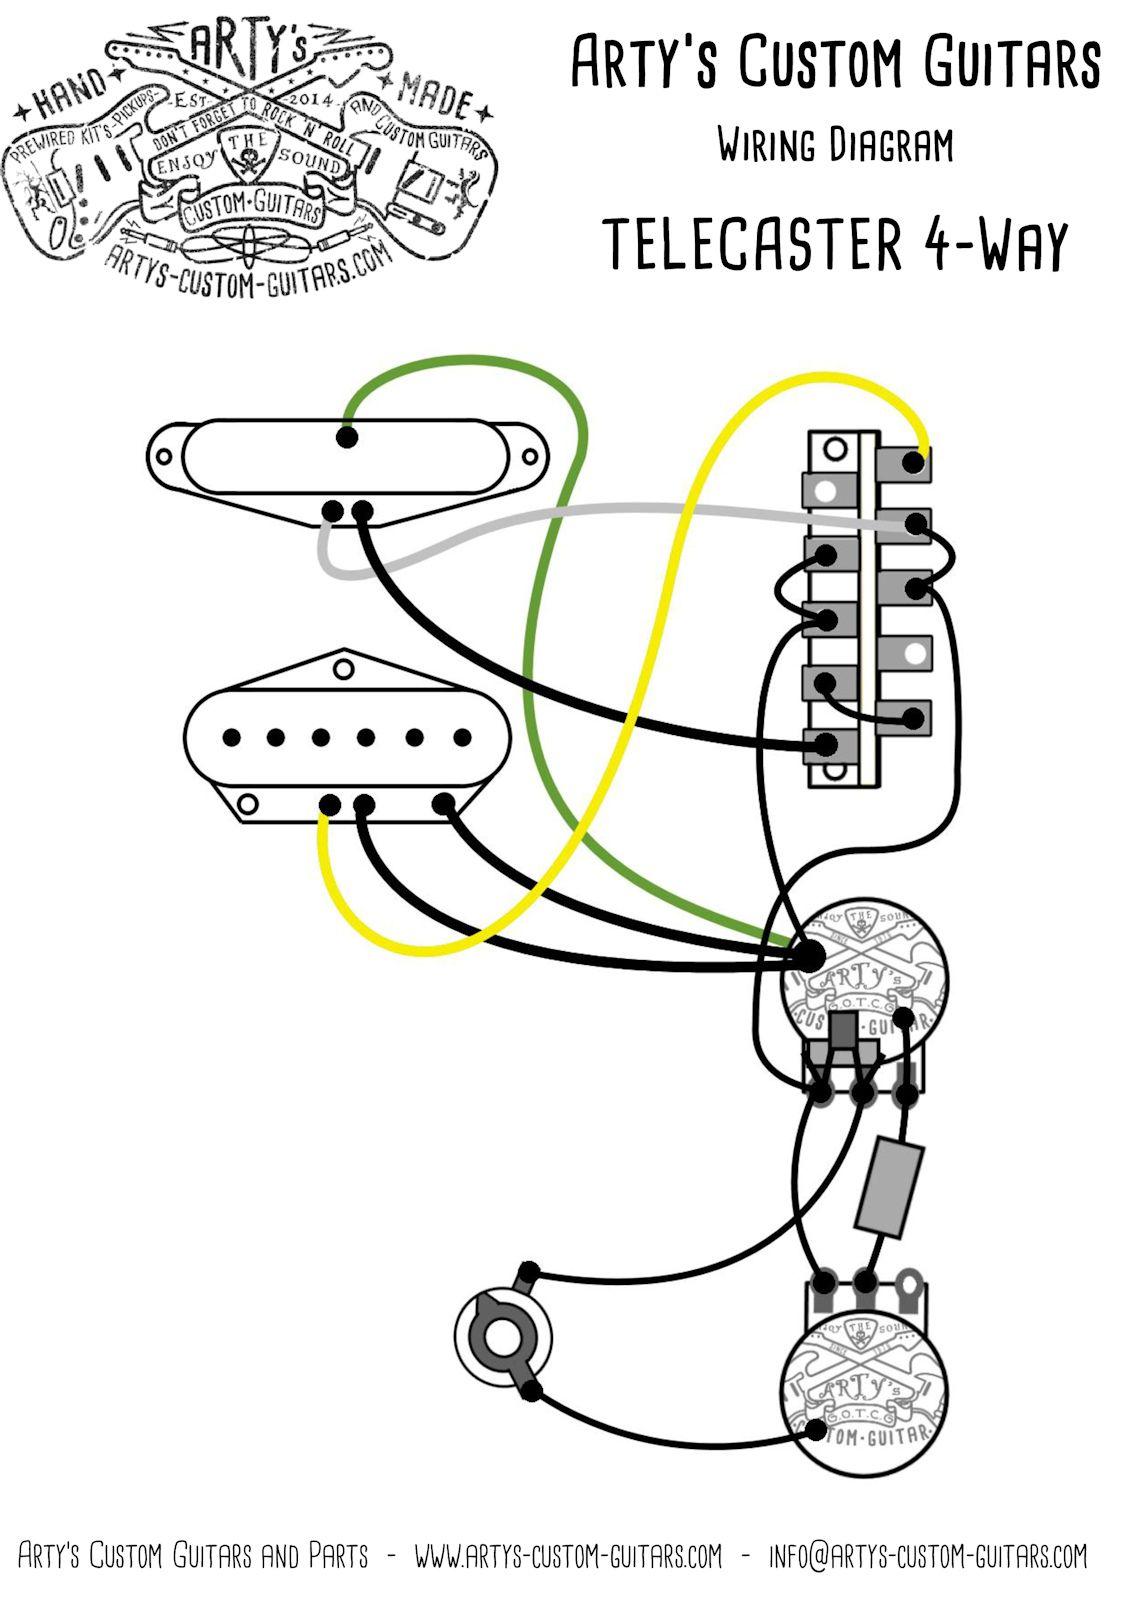 arty s custom guitars wiring diagram plan telecaster assembly harness tele [ 1132 x 1600 Pixel ]